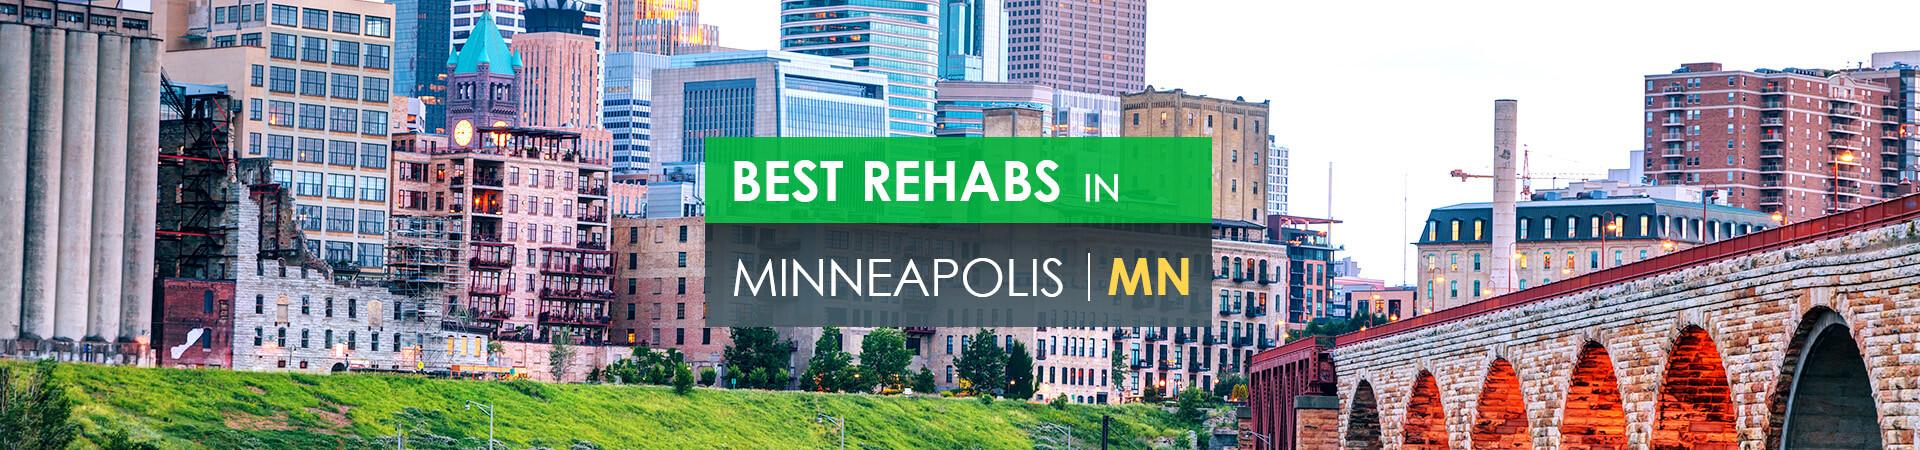 Best rehabs in Minneapolis, MN